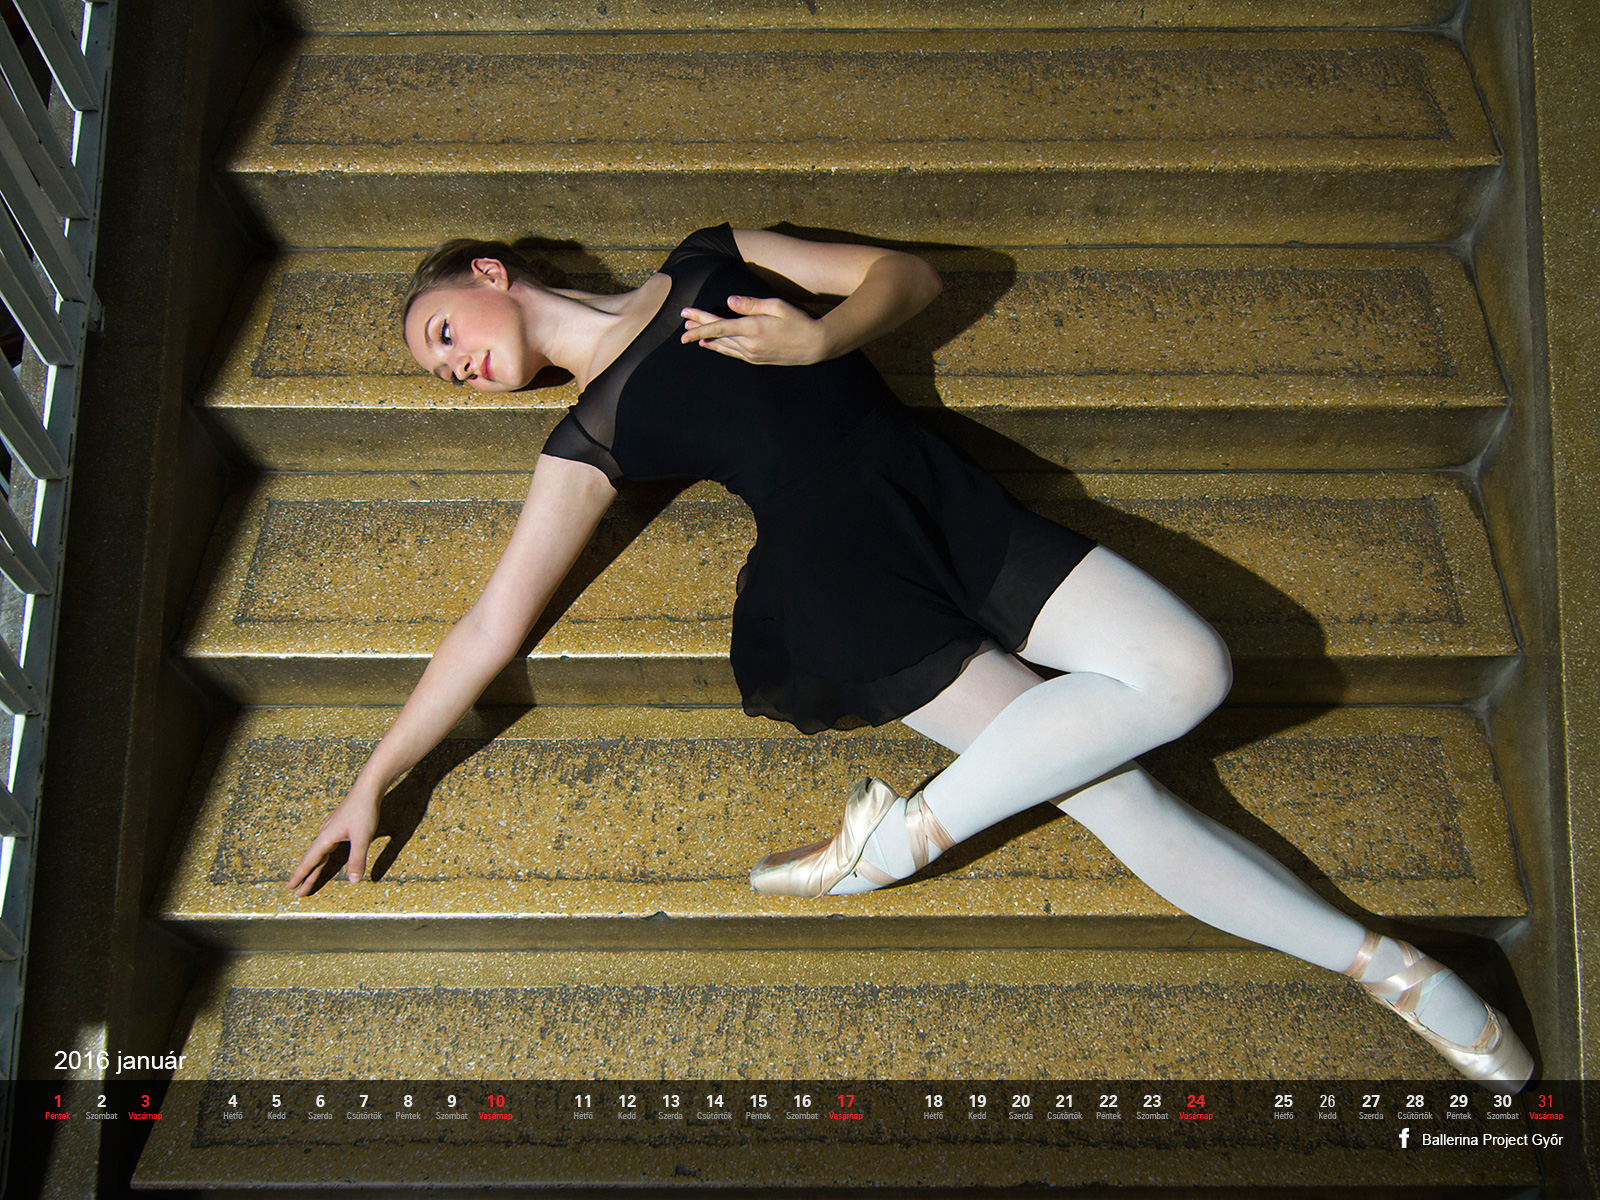 Ballerina Project Győr naptár 2015. december